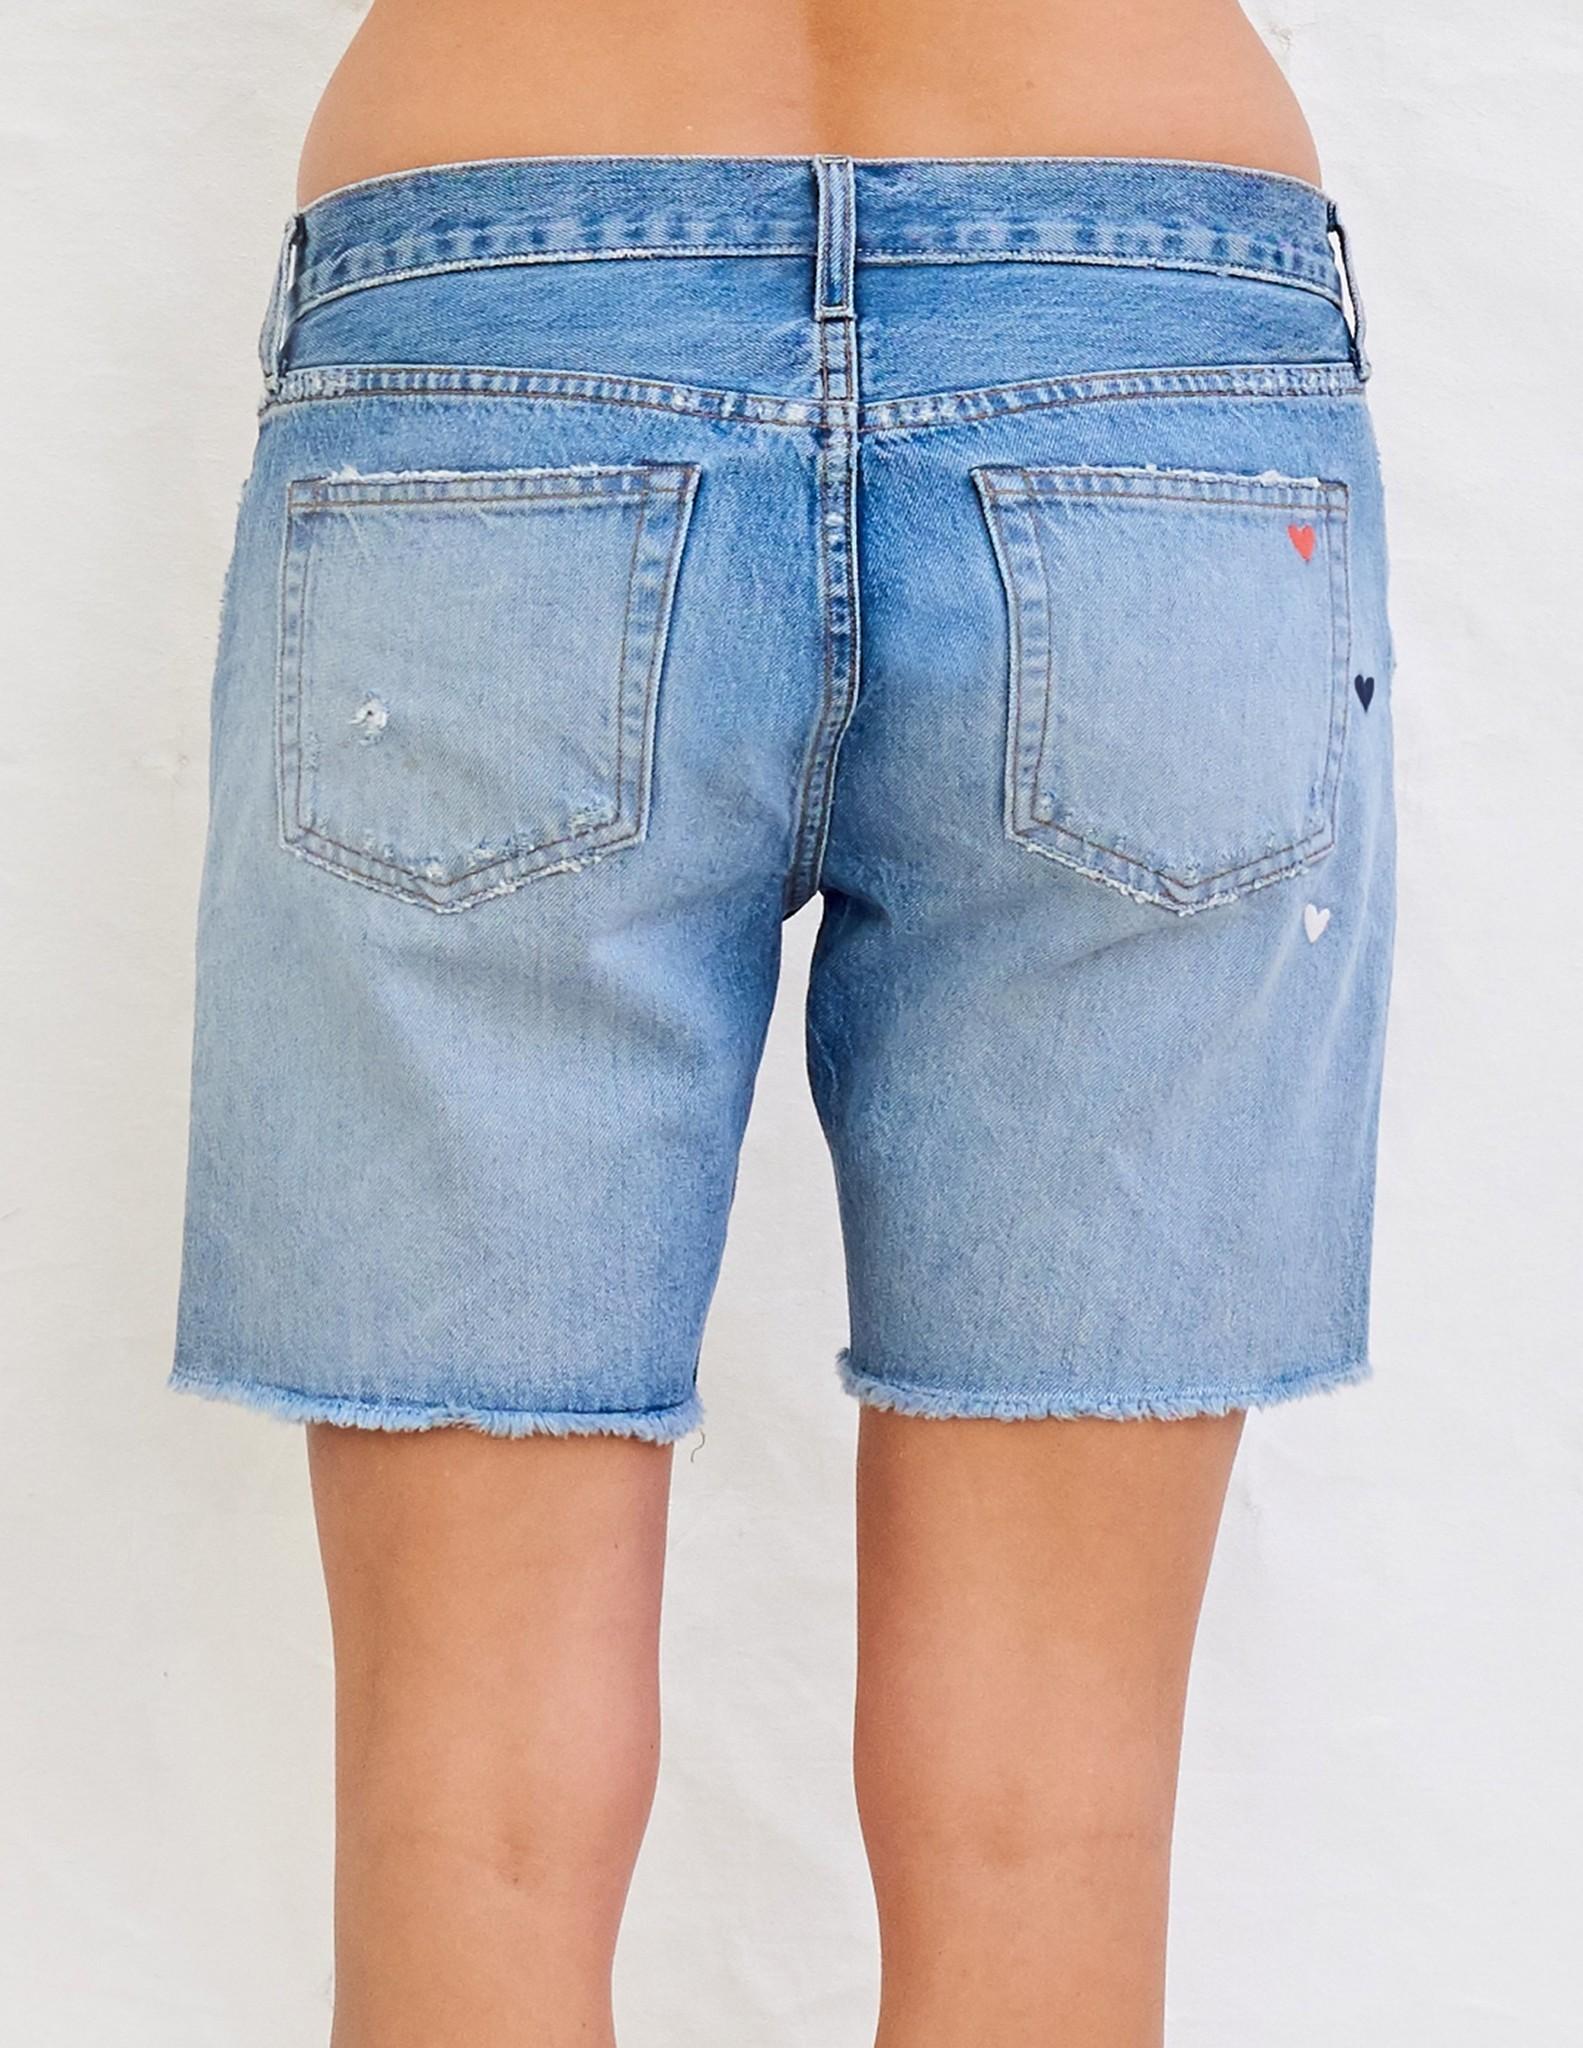 Sundry Heart Embroidered Denim Shorts